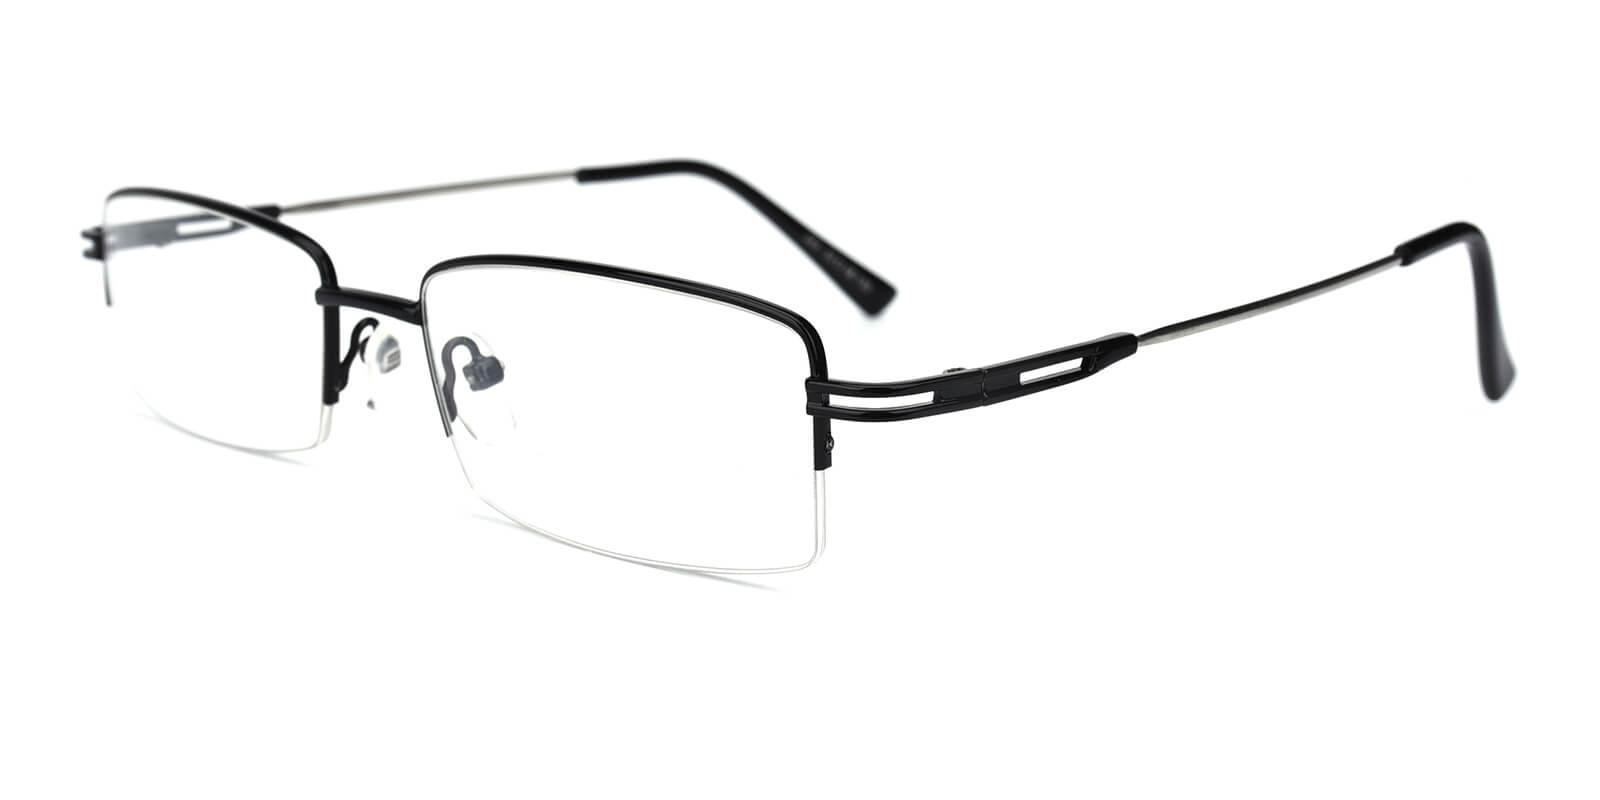 Studio-Black-Rectangle-Metal-Eyeglasses-detail